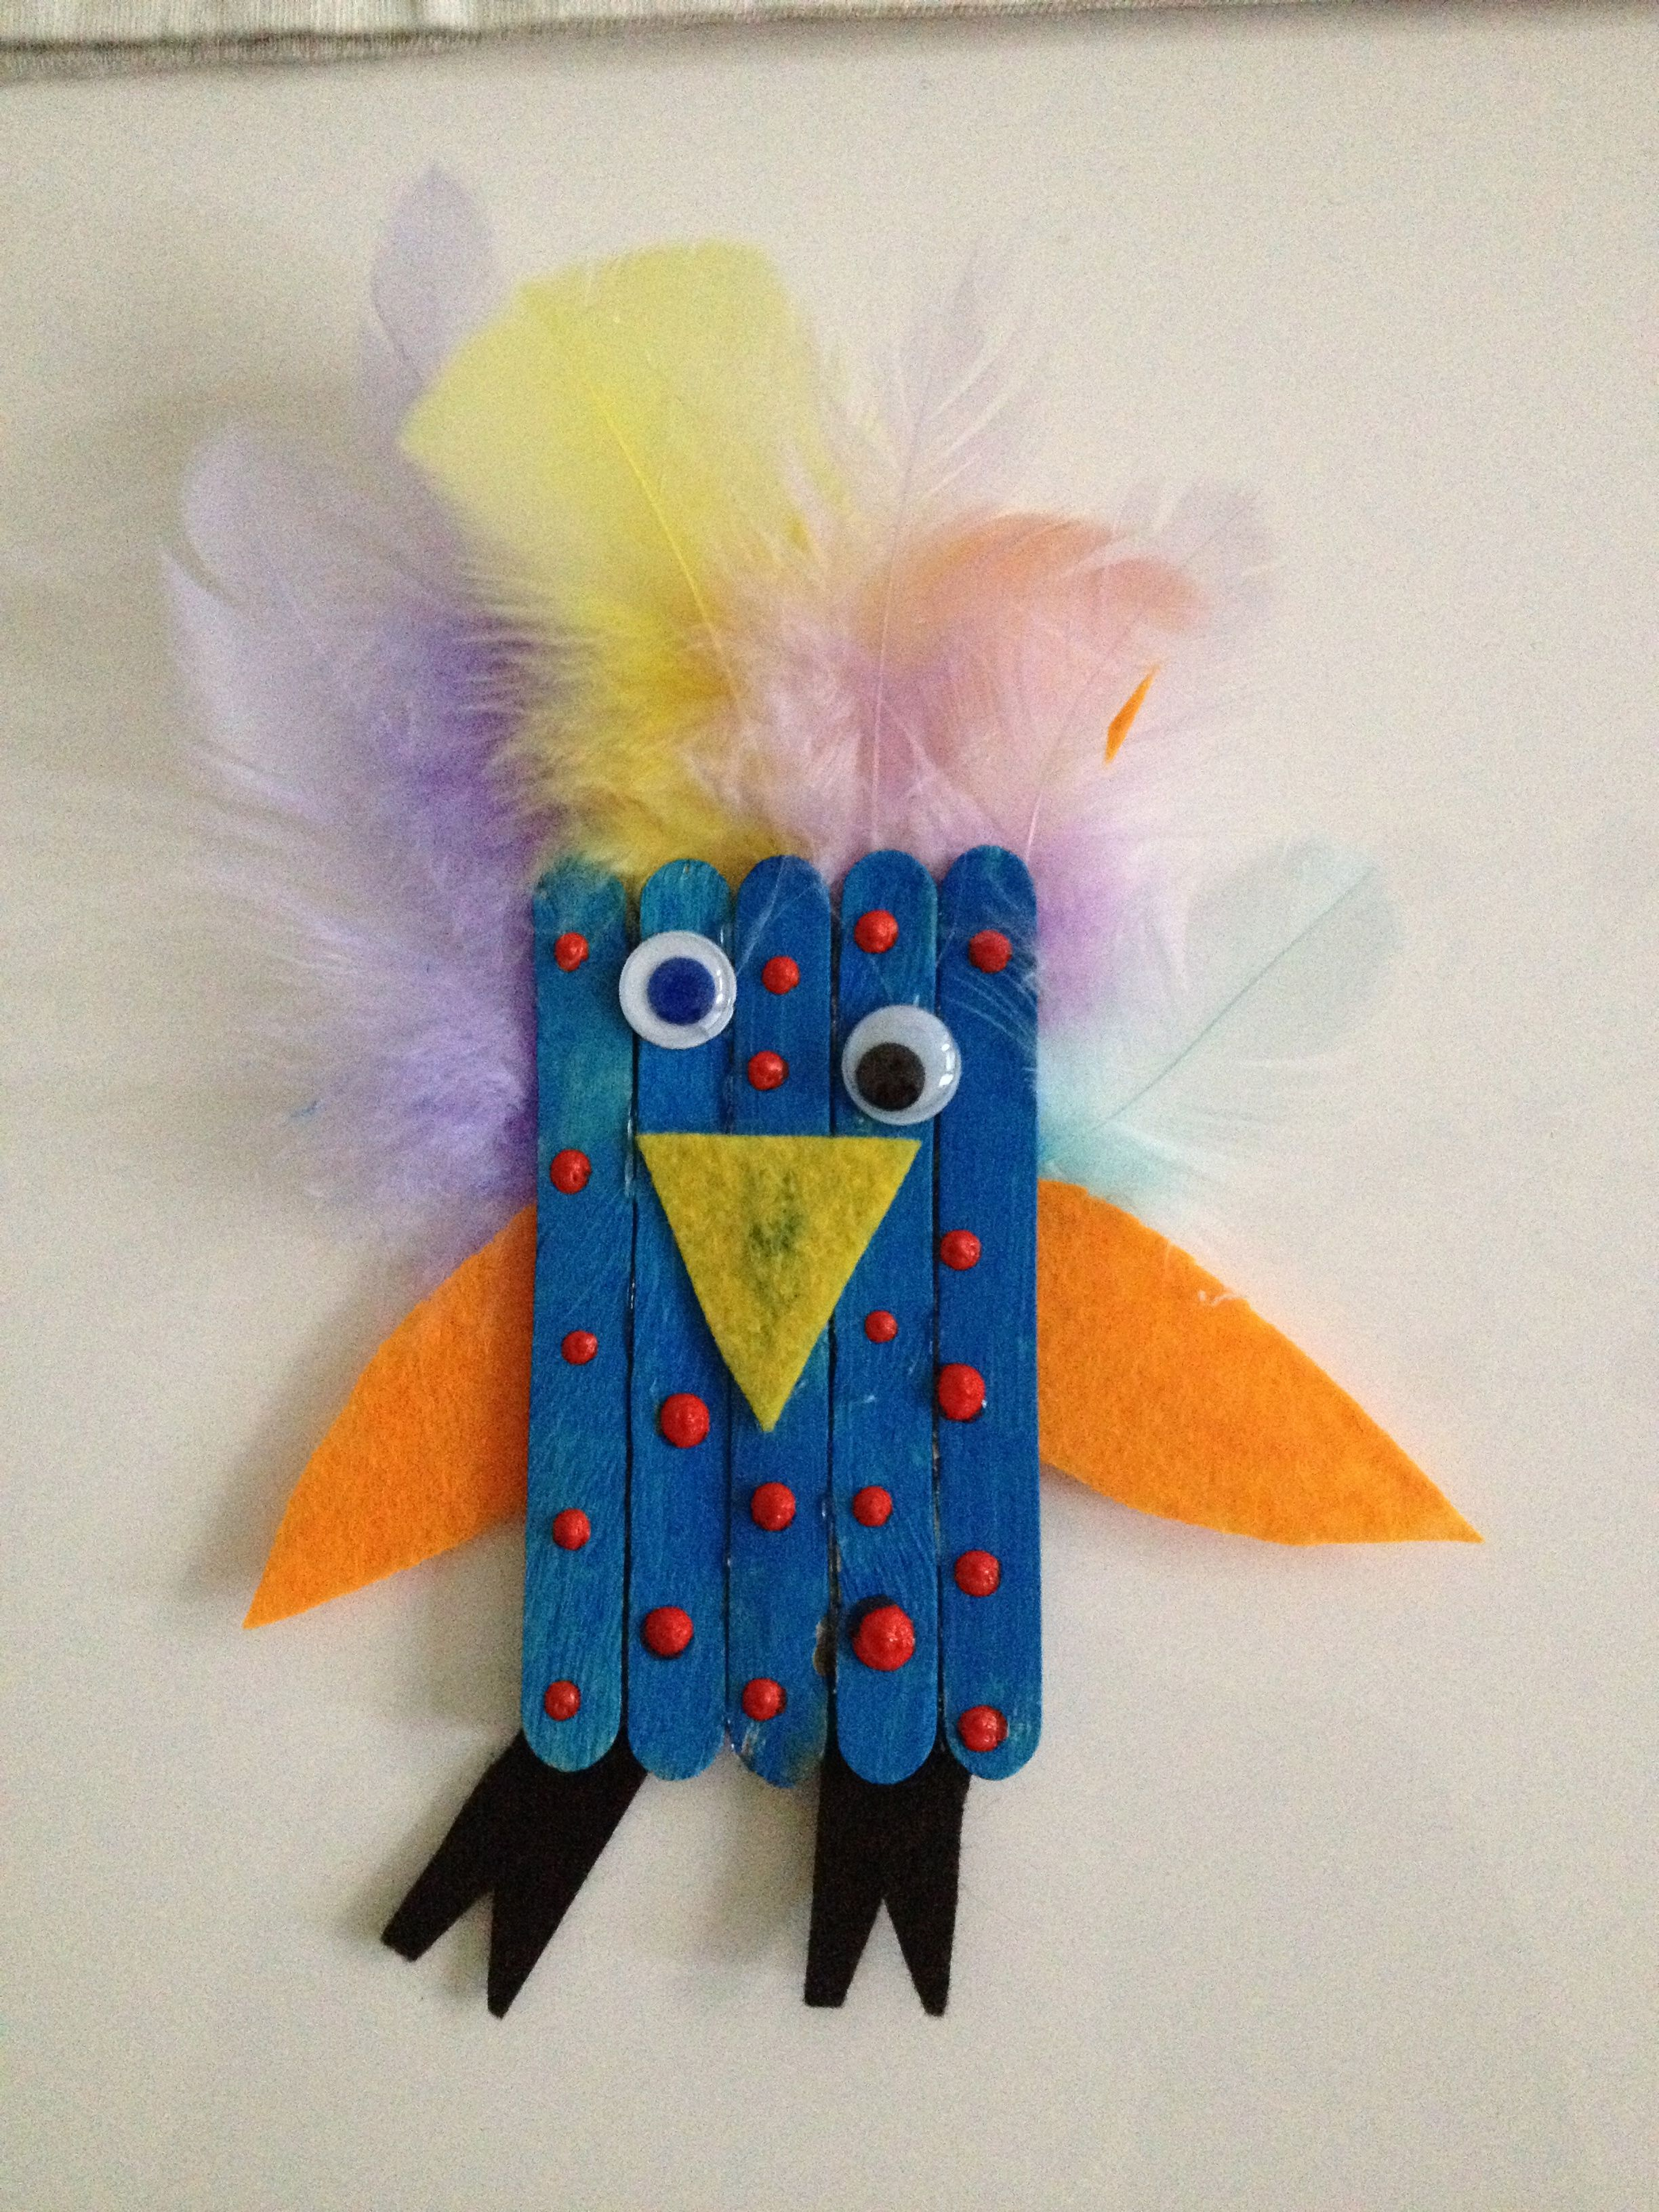 Oiseau Baton A Glace Bricolage Enfant